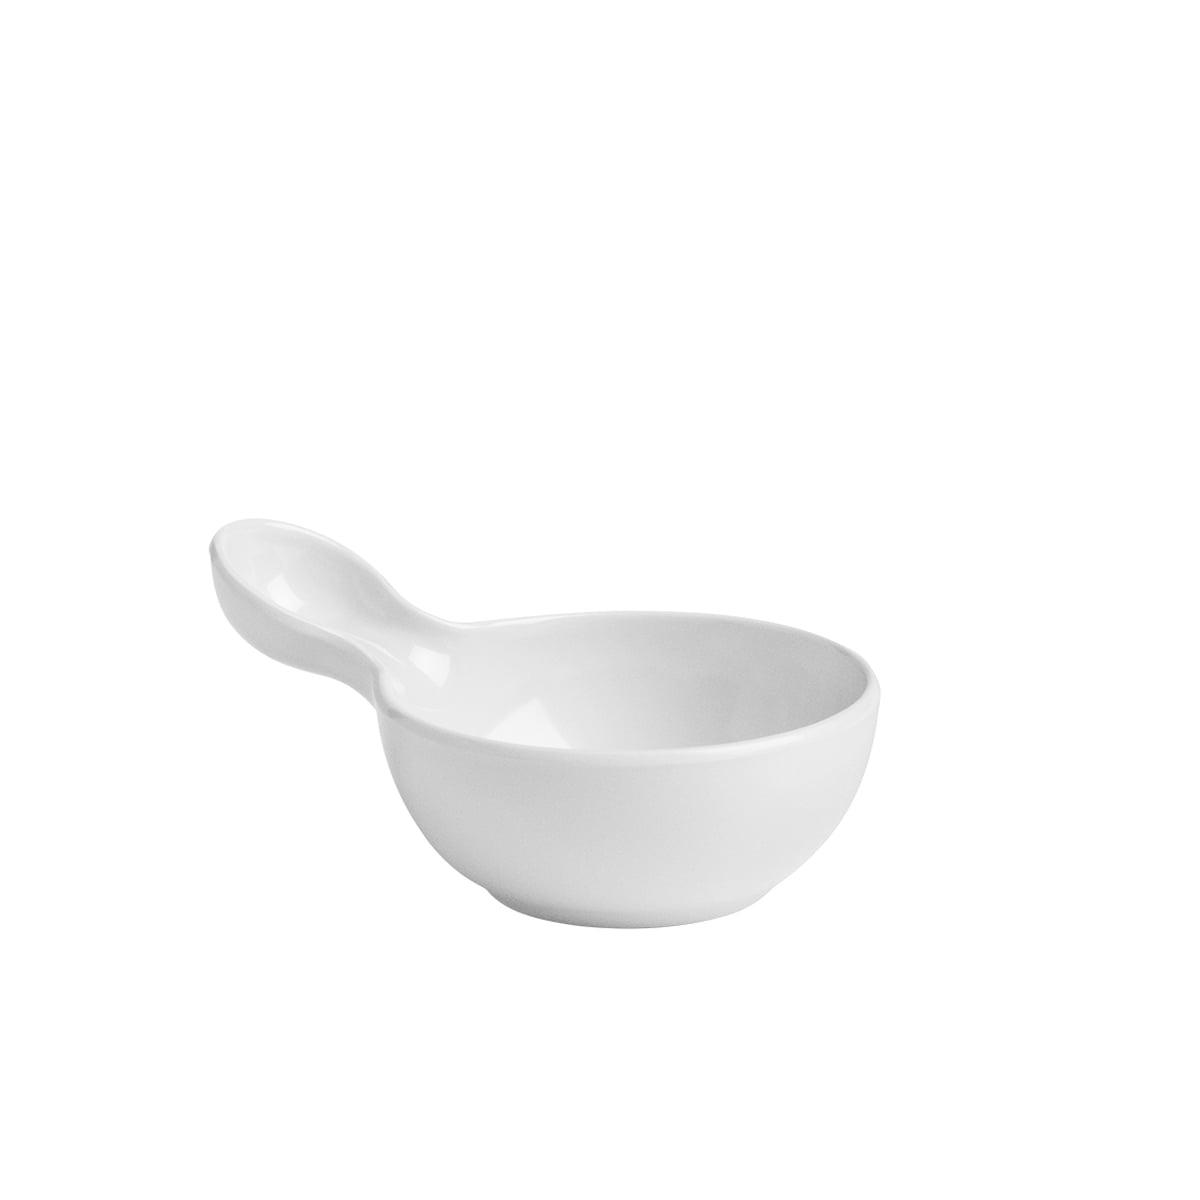 Bowl 300 ml, weiß